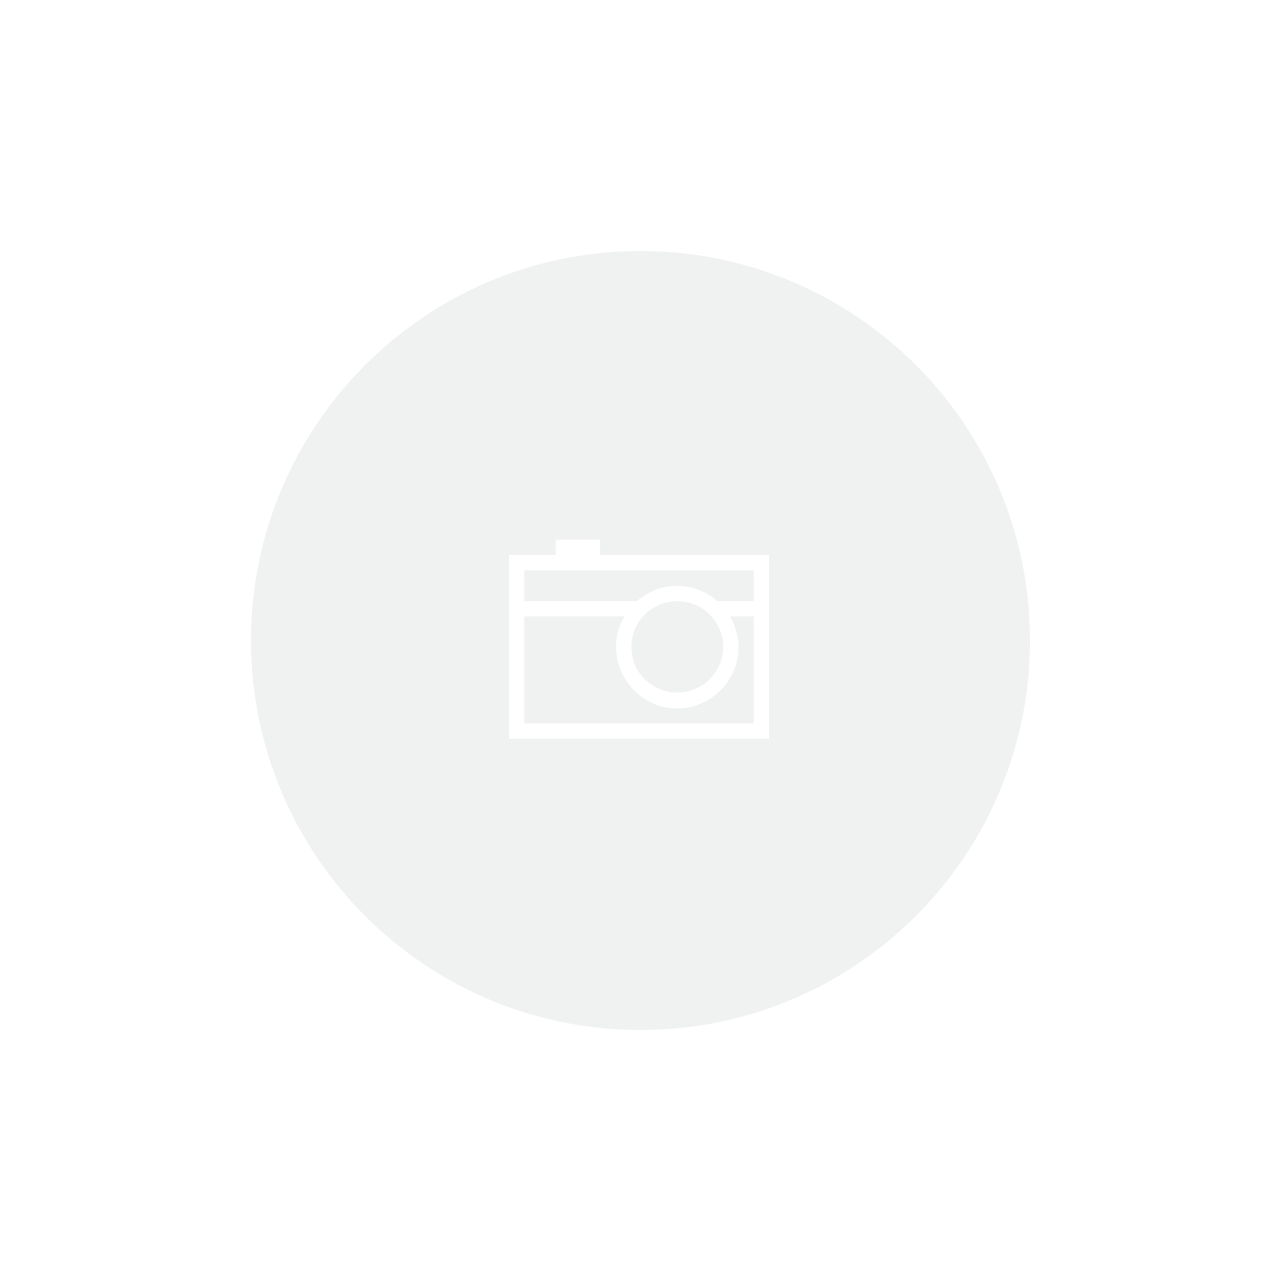 Papel Textura Color Plus 180g - Ref. 23 Porto Seguro